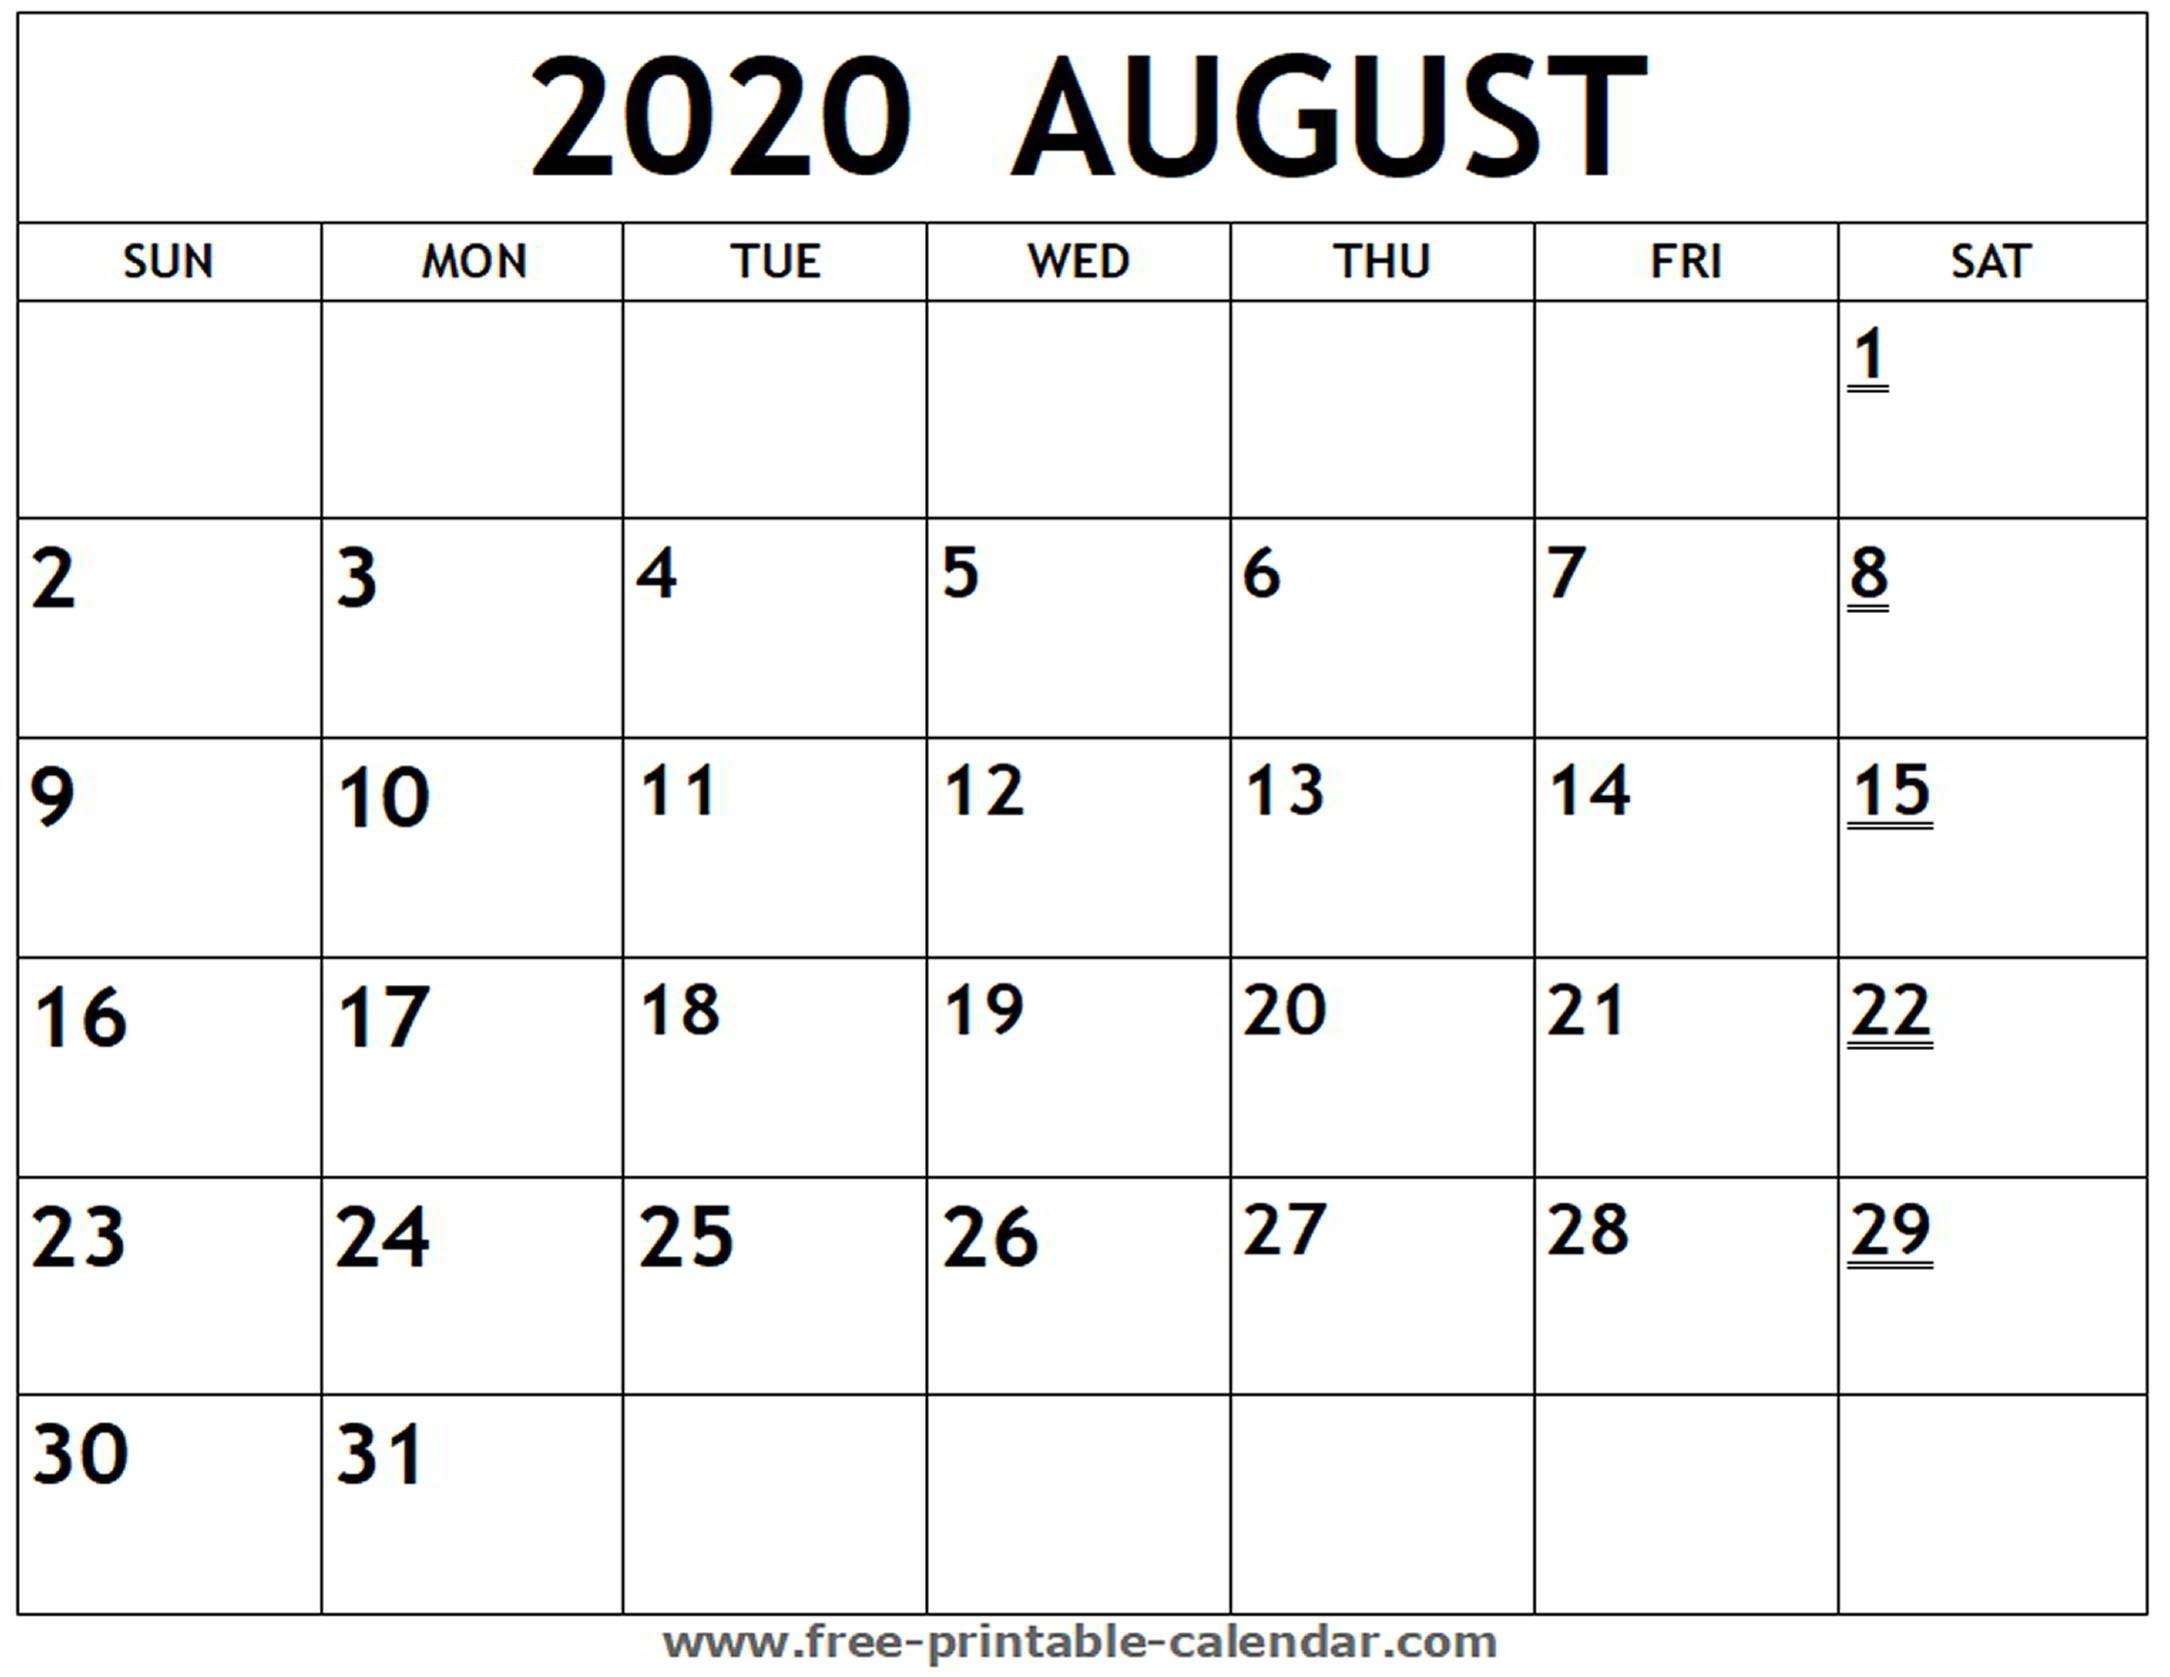 Printable 2020 August Calendar - Free-Printable-Calendar-Printable Blank Monthly Calendar 2020 August